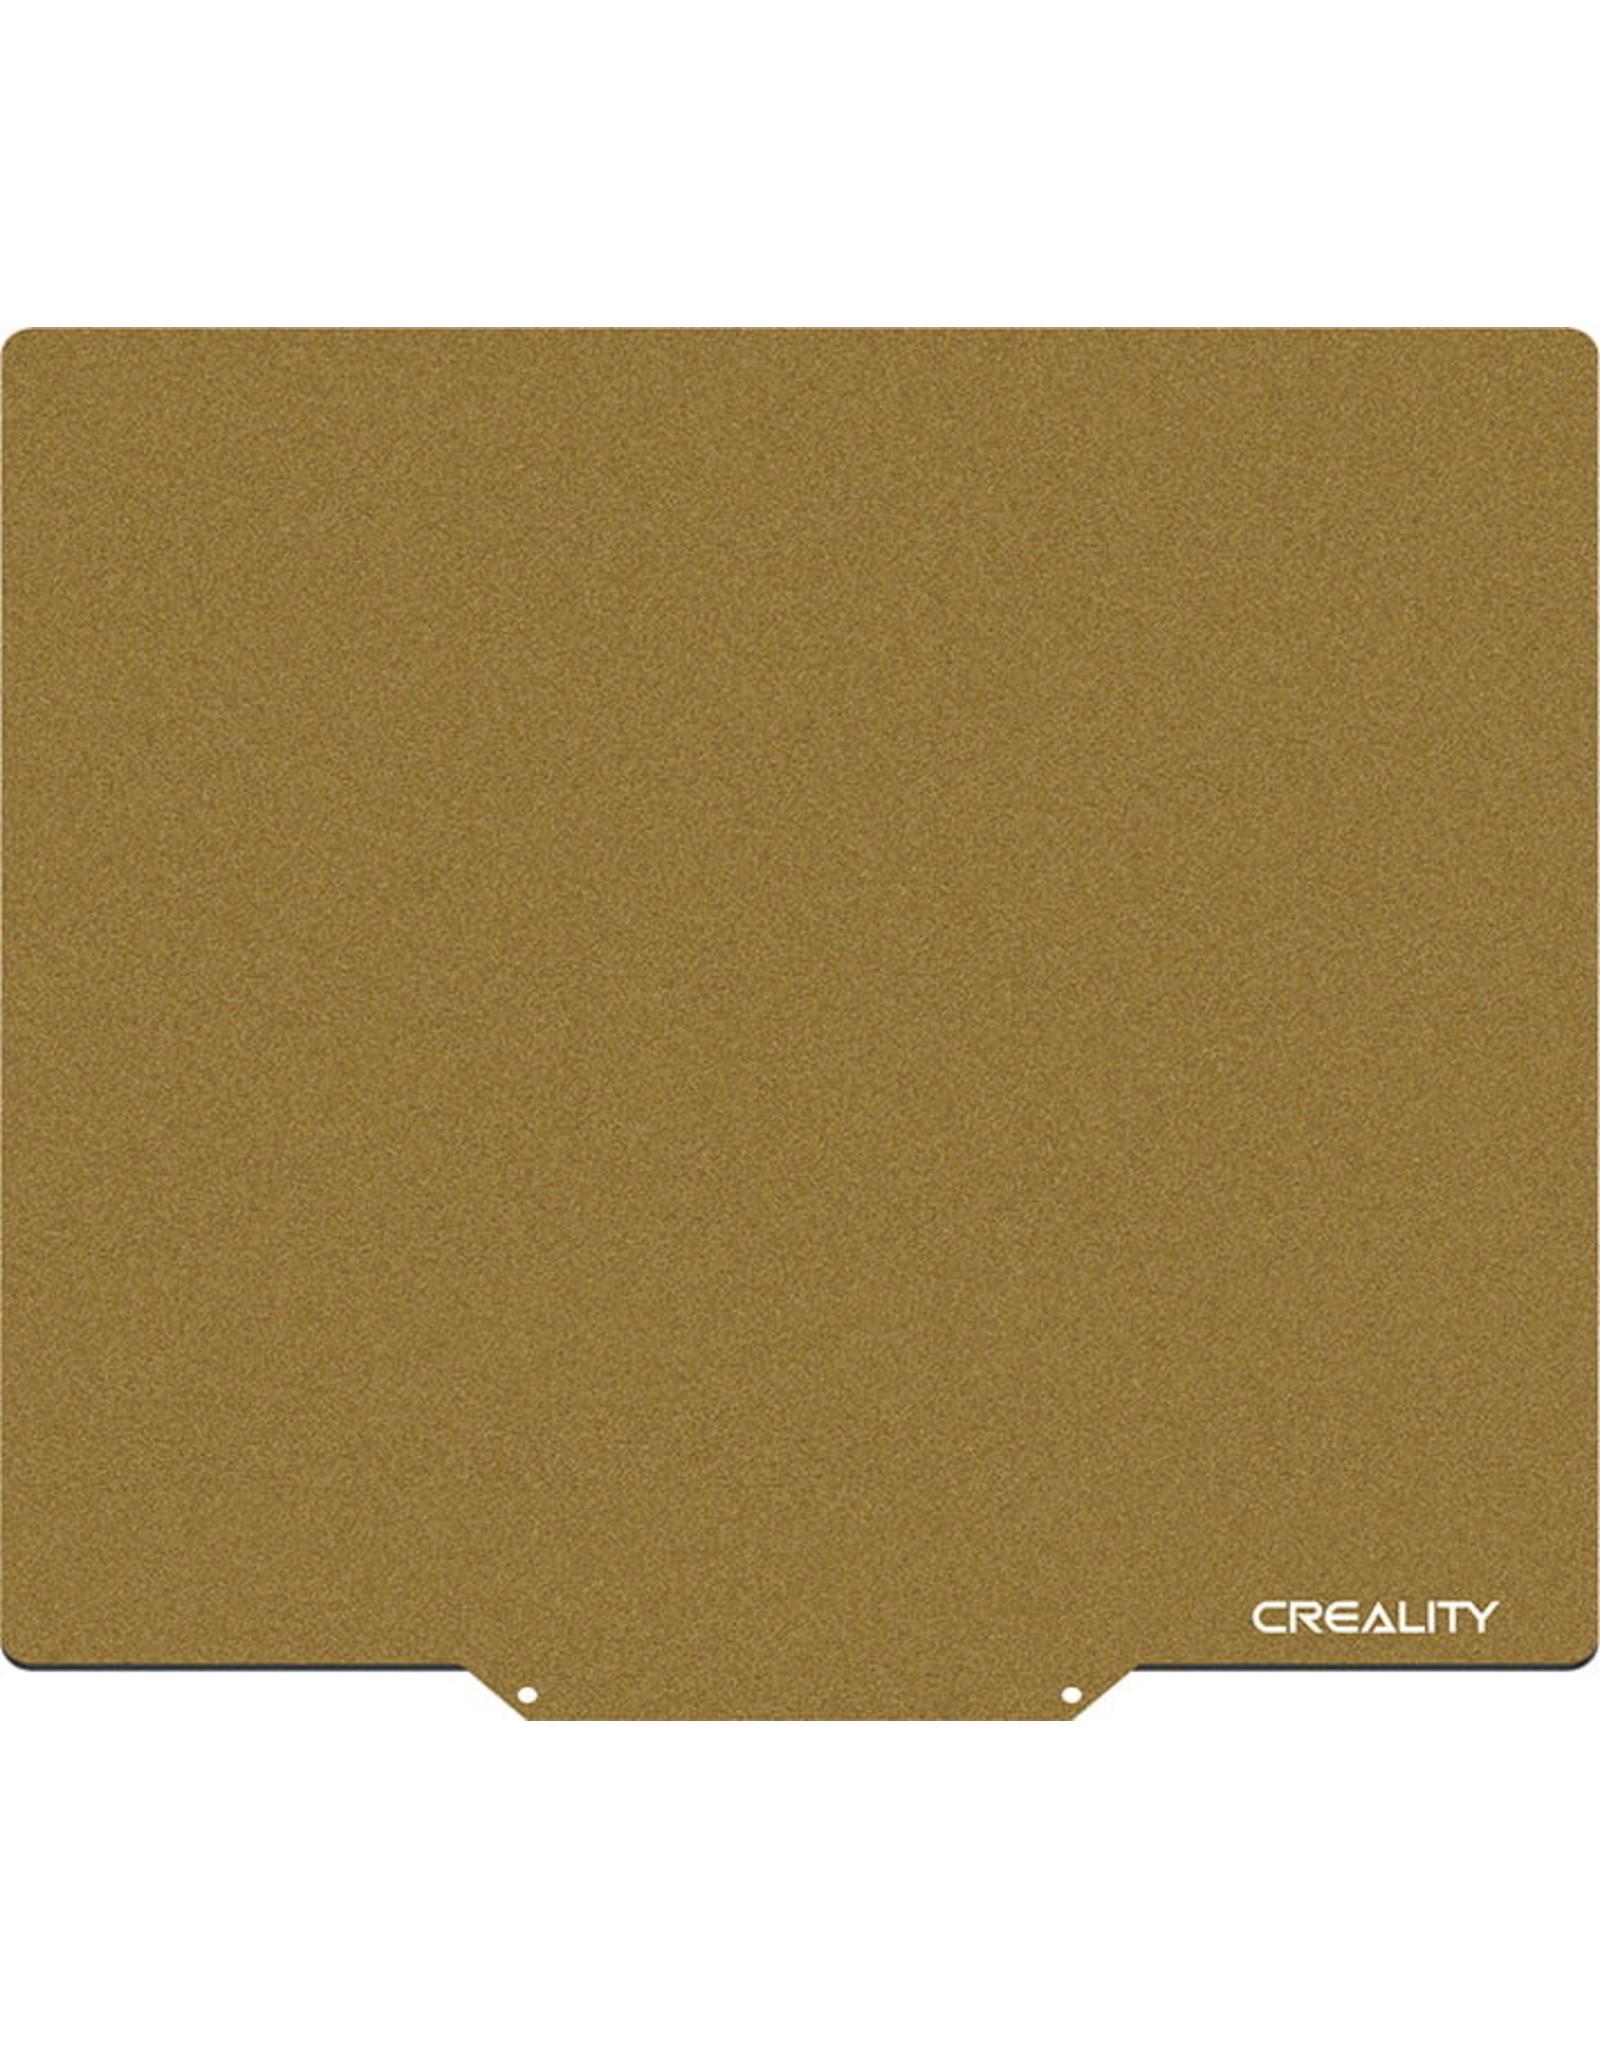 Creality/Ender Creality PEI Flexible Building Board for Ender 5 plus